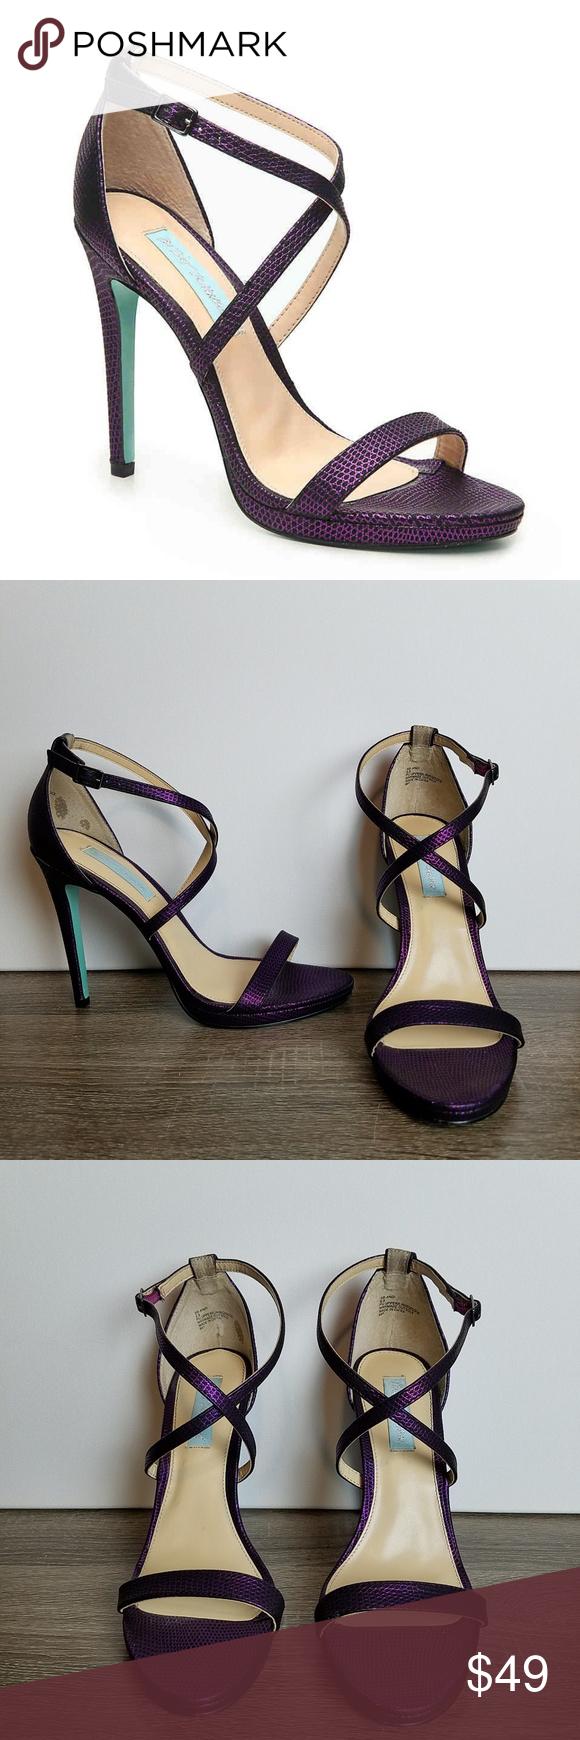 Betsey Johnson Dina Platform Sandals